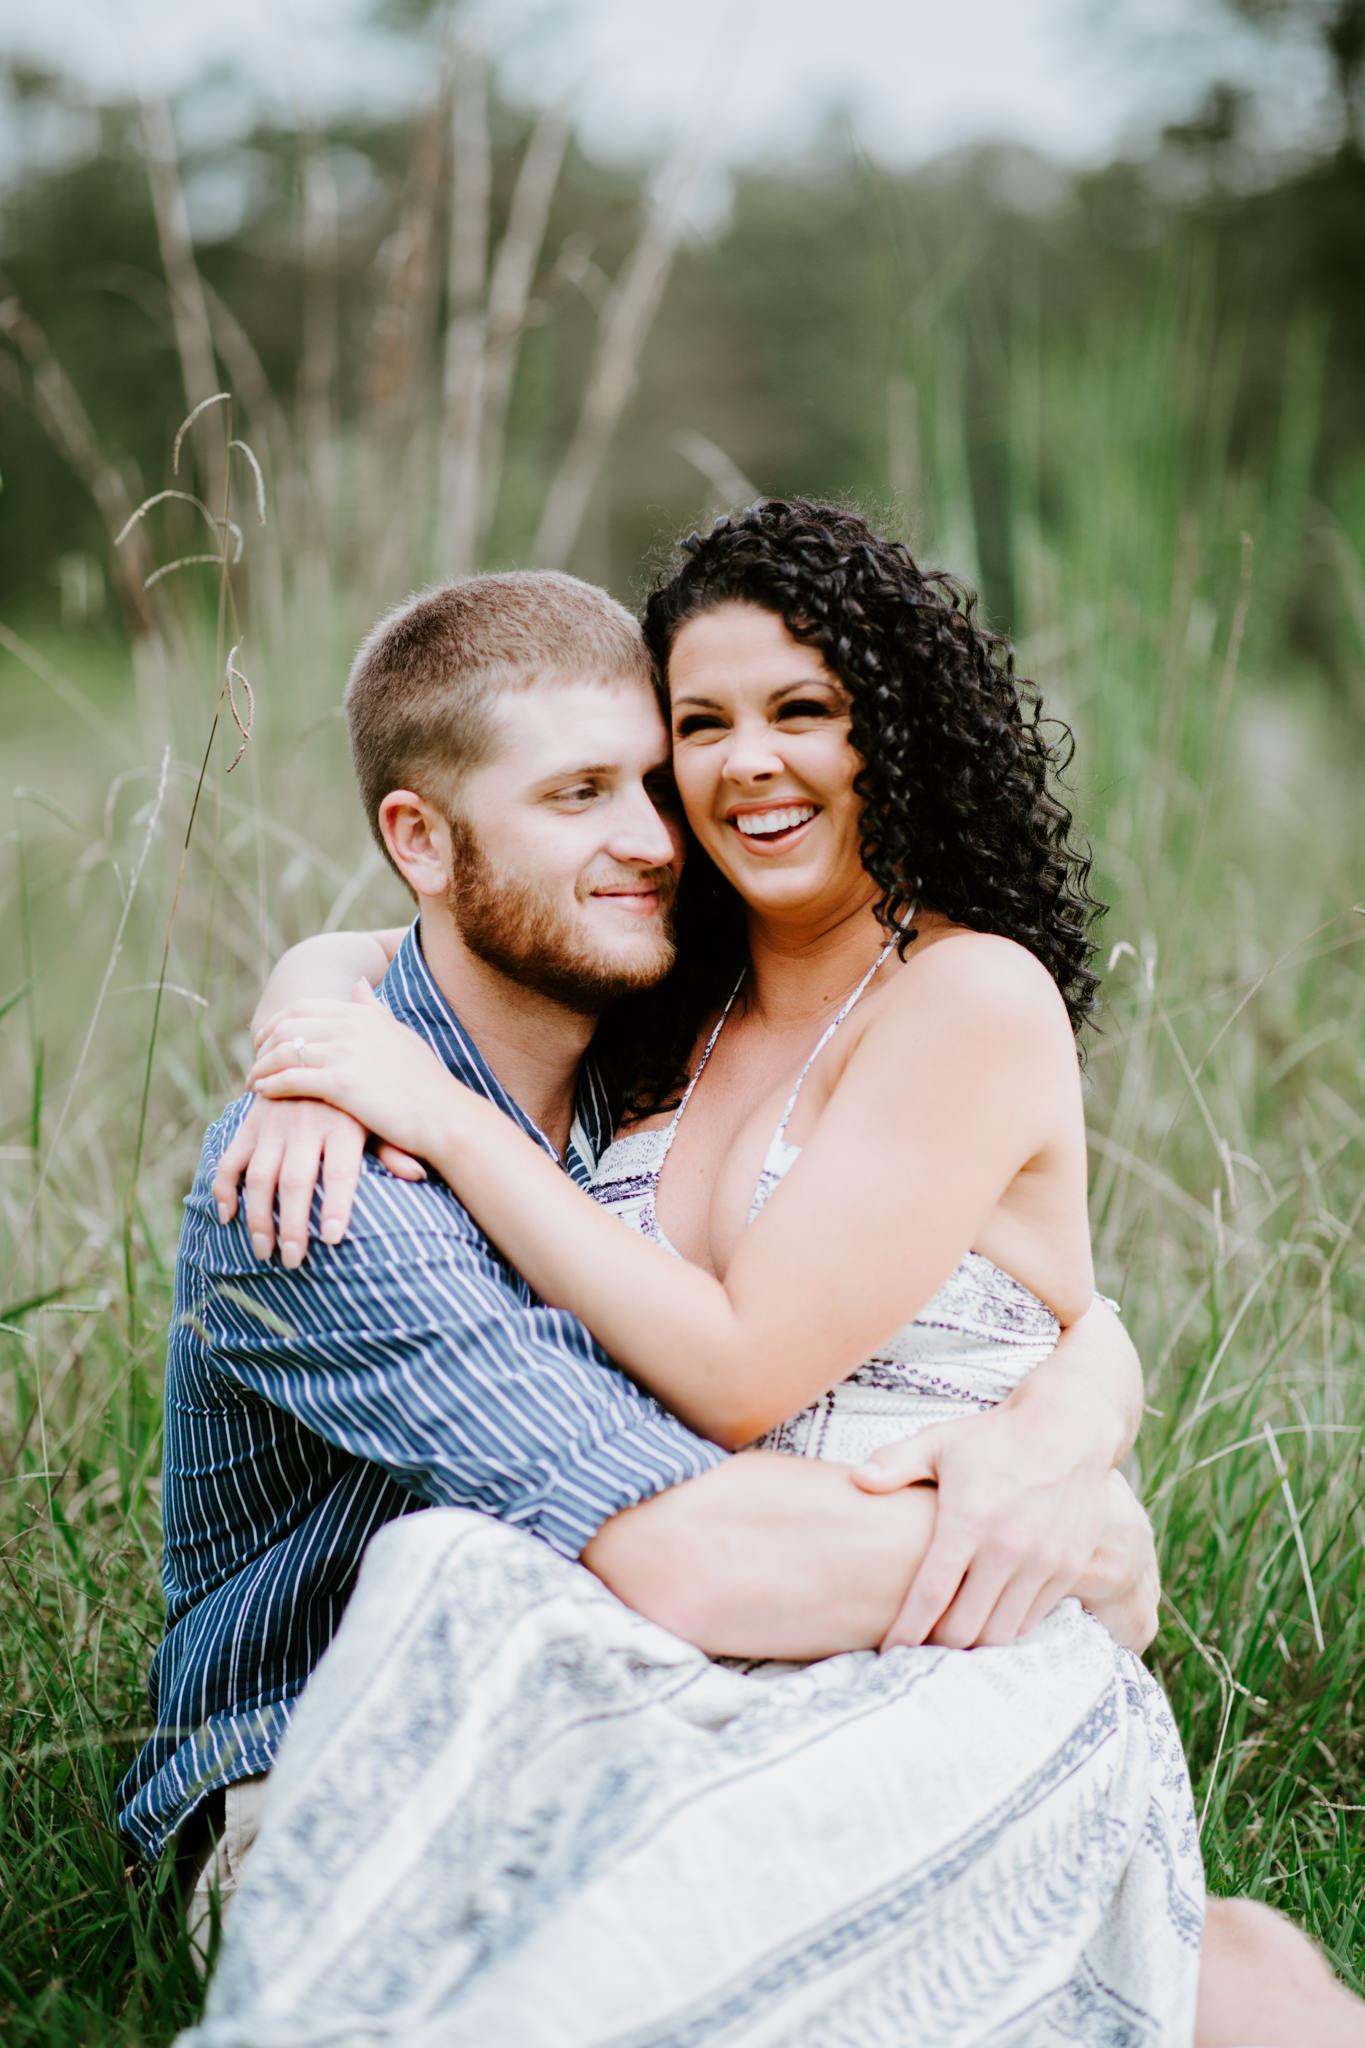 Kaci + Matt + Chattanooga + Nashville + Tennessee + Wedding + Photographer-31.jpg